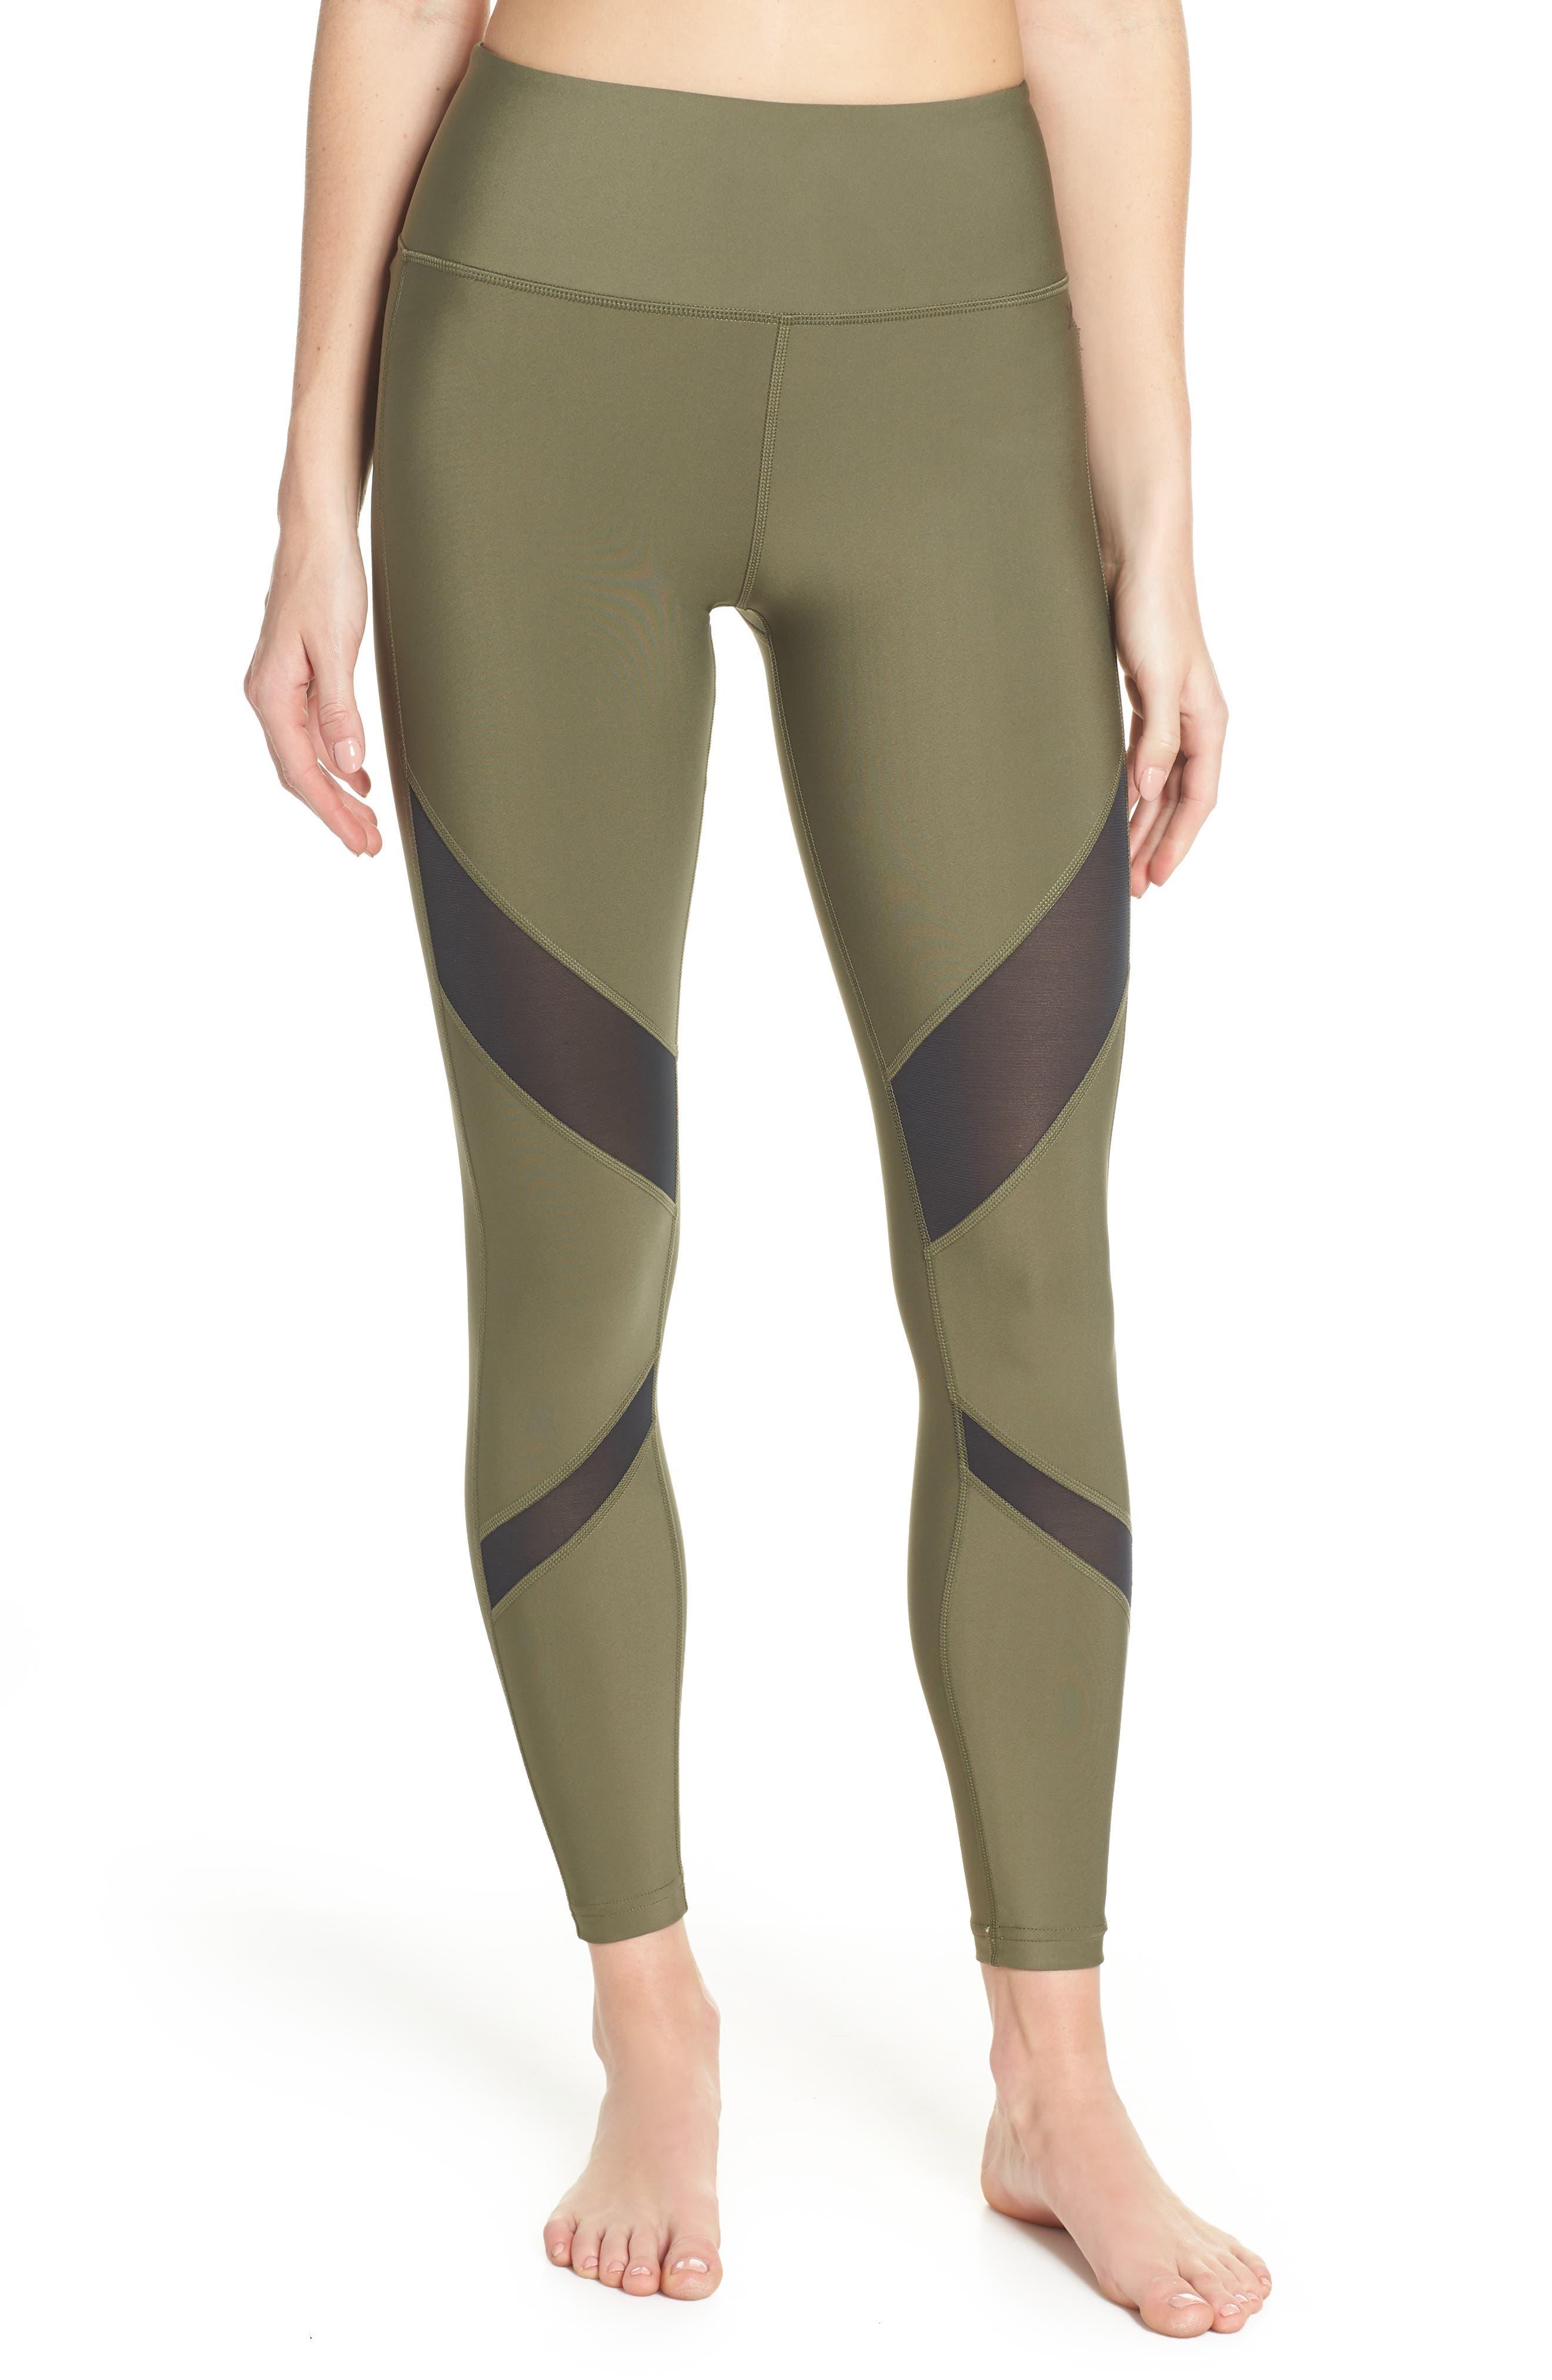 Hurley Quick Dry Mesh Leggings, Green